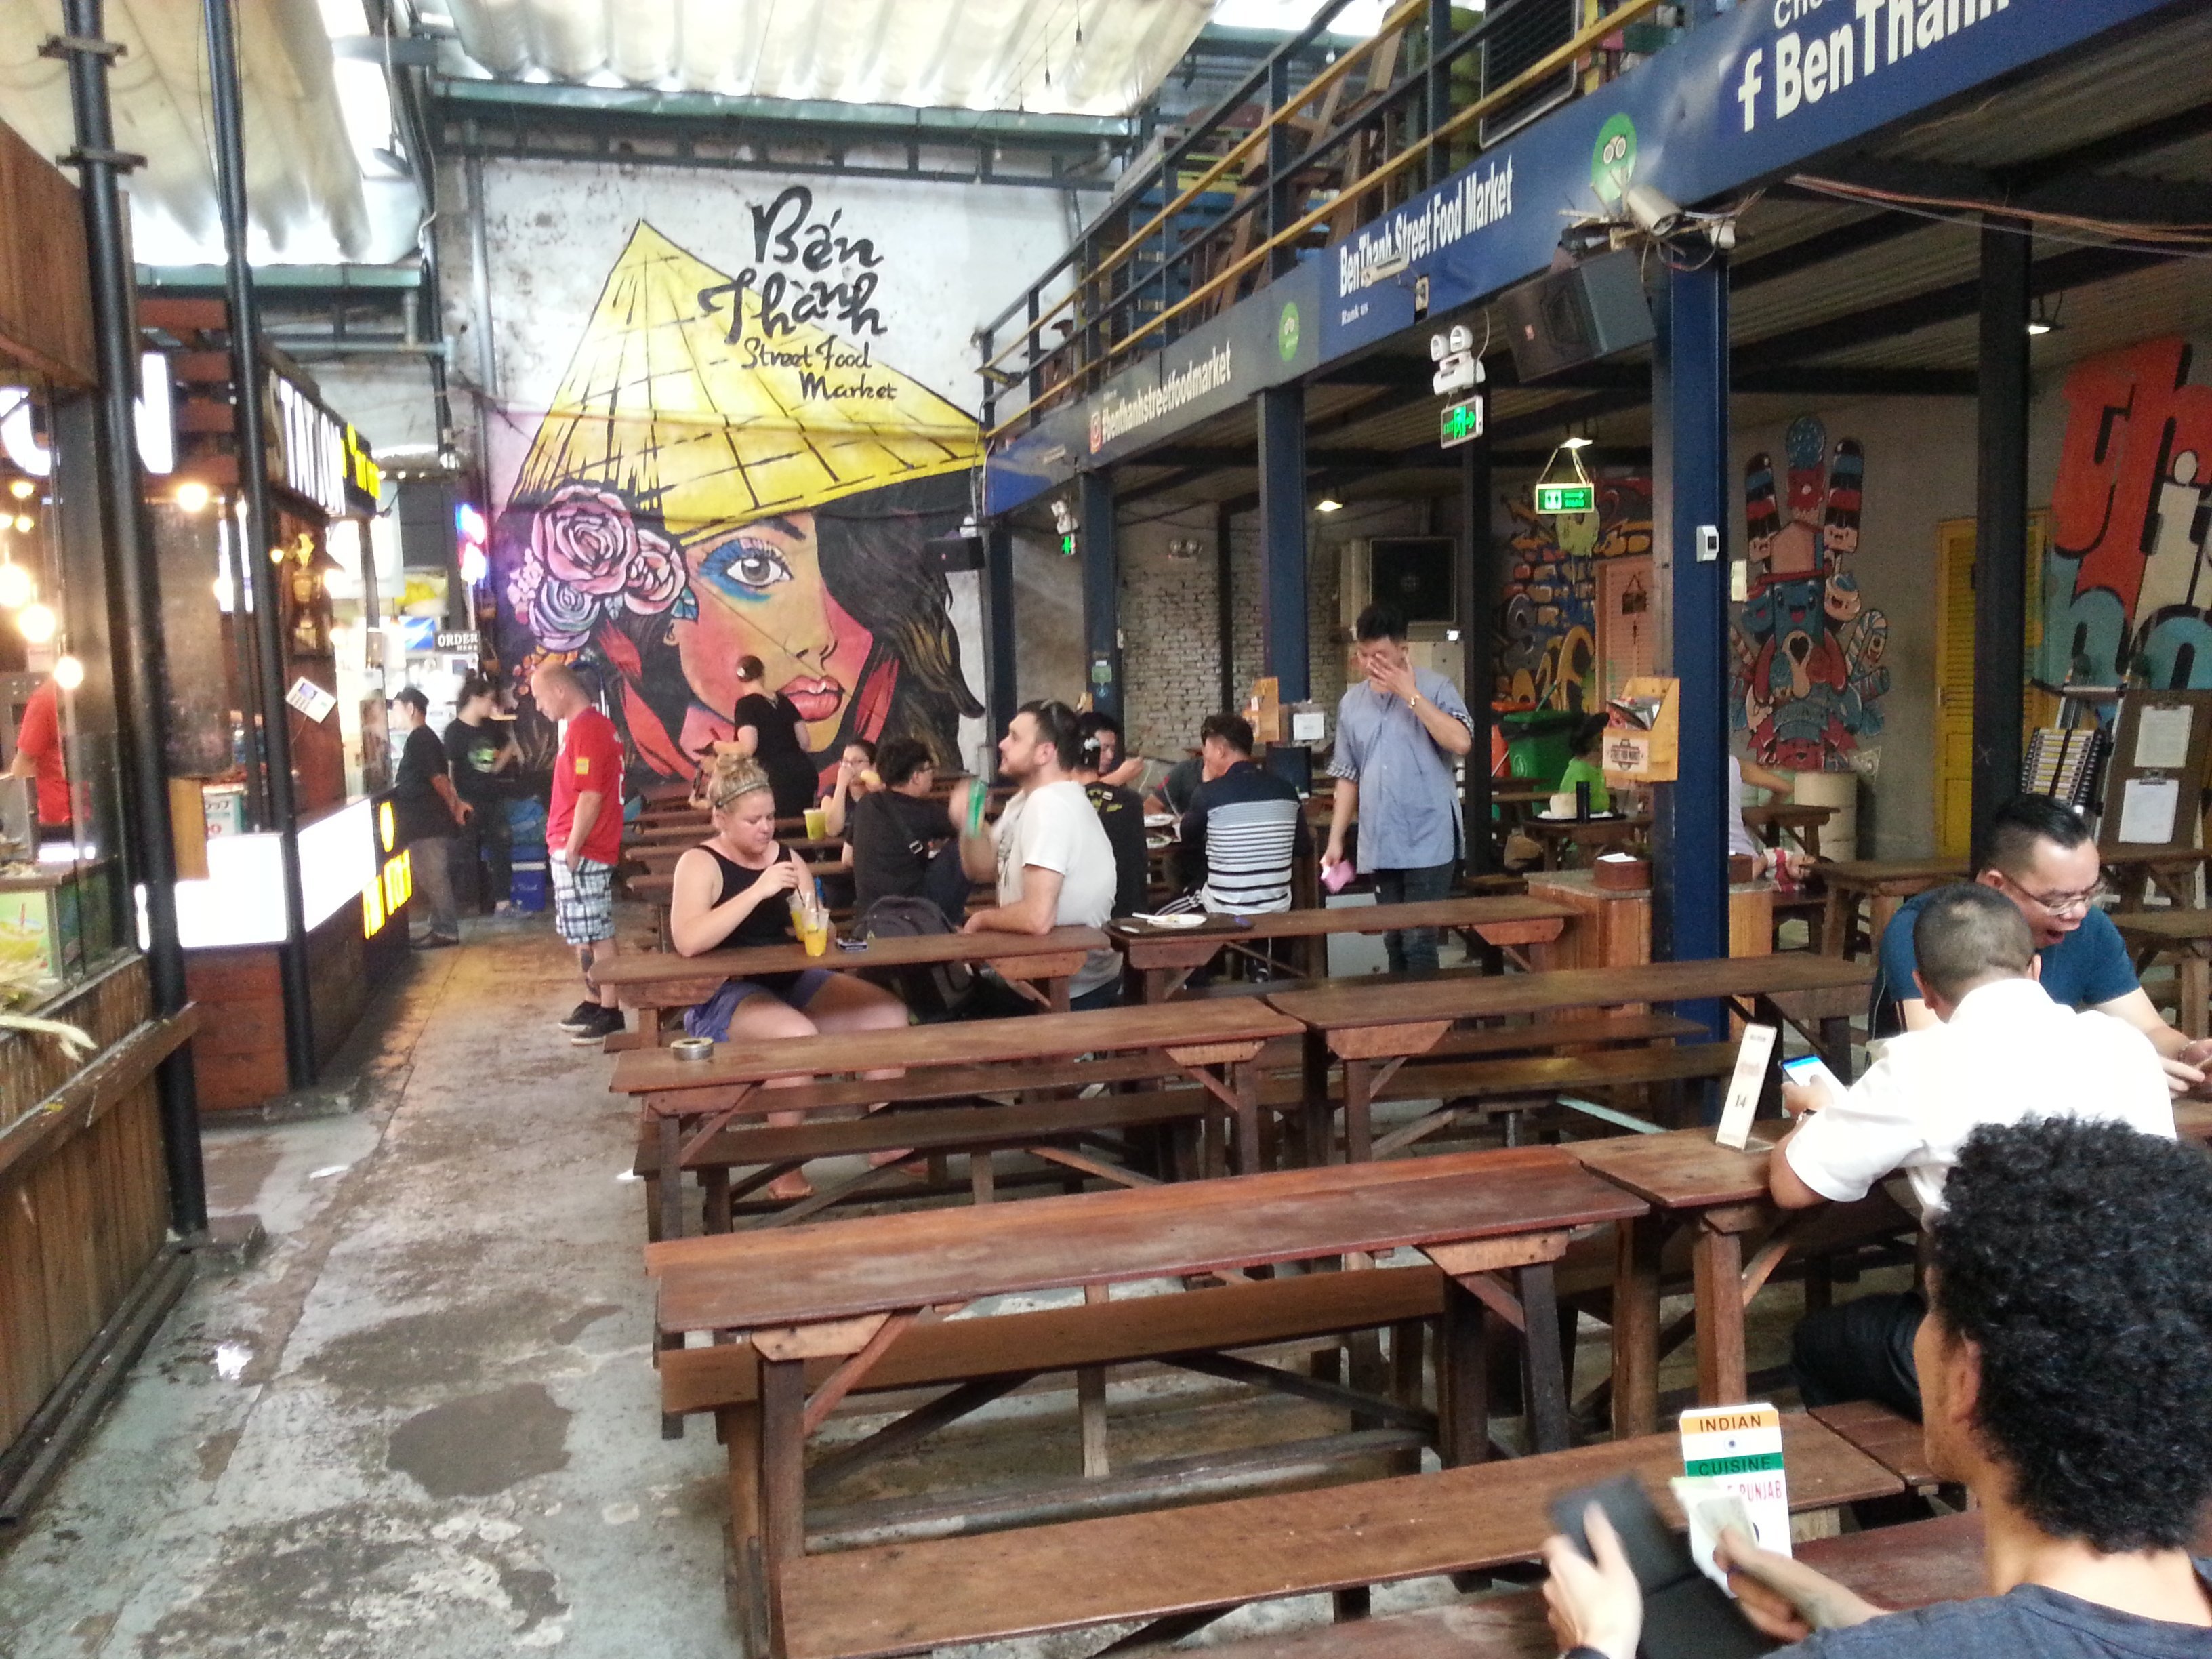 Artwork at Ben Thanh Street Food Market